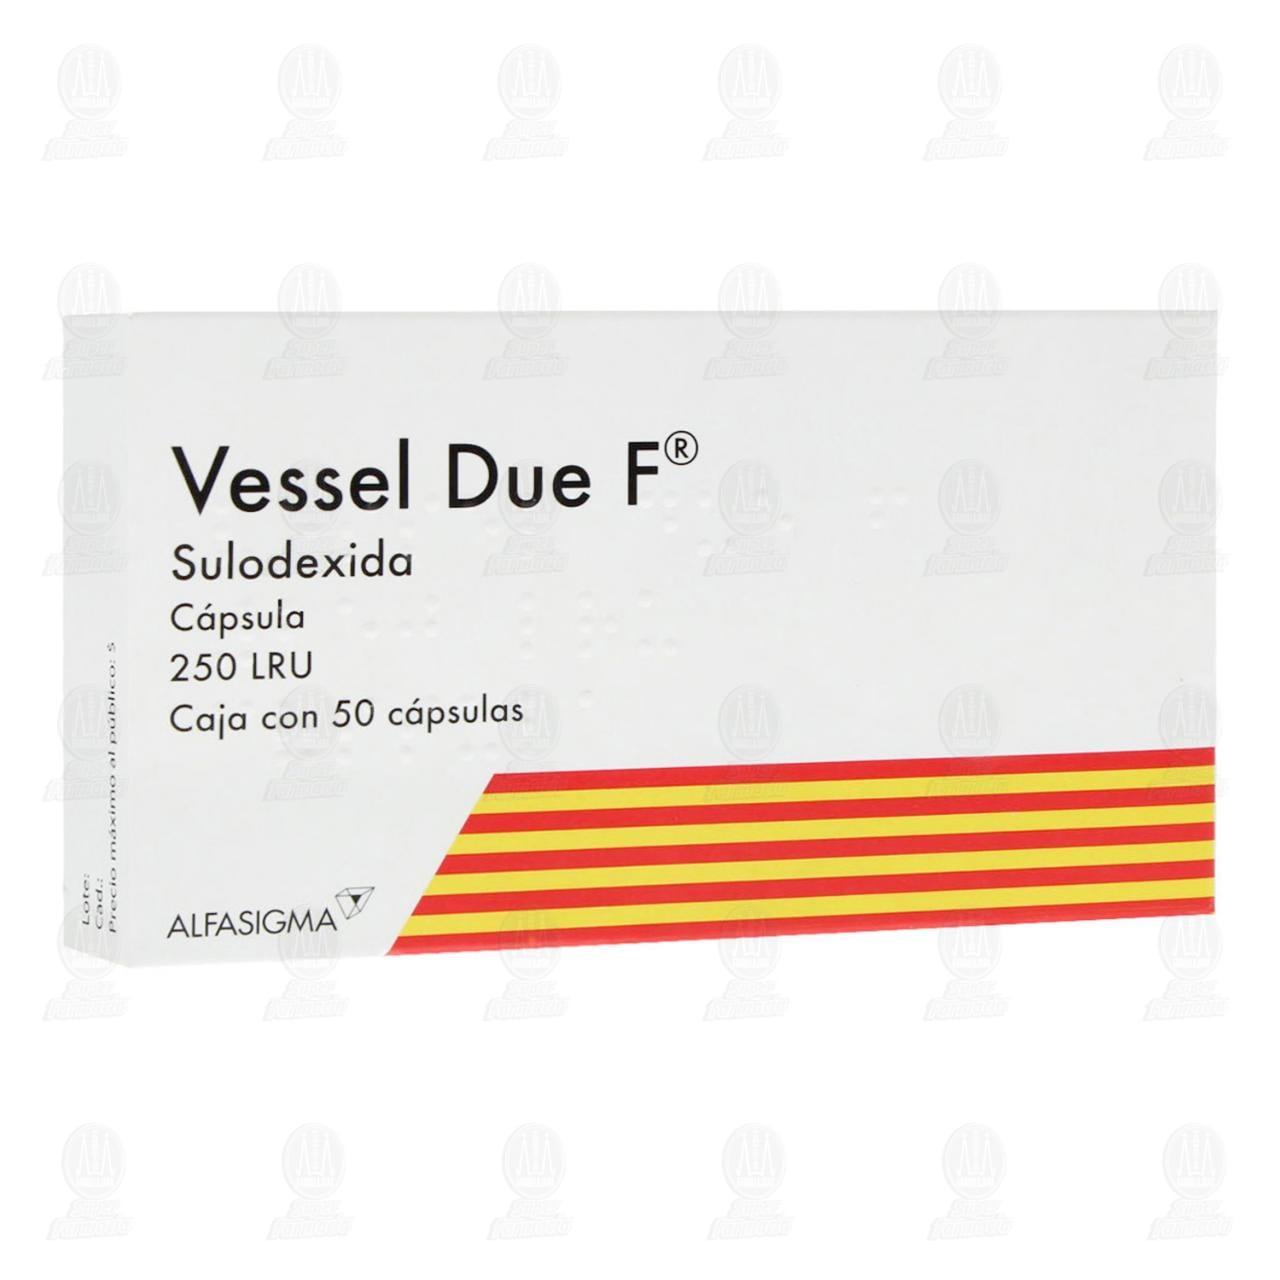 Vessel Due F 250lru 50 Cápsulas